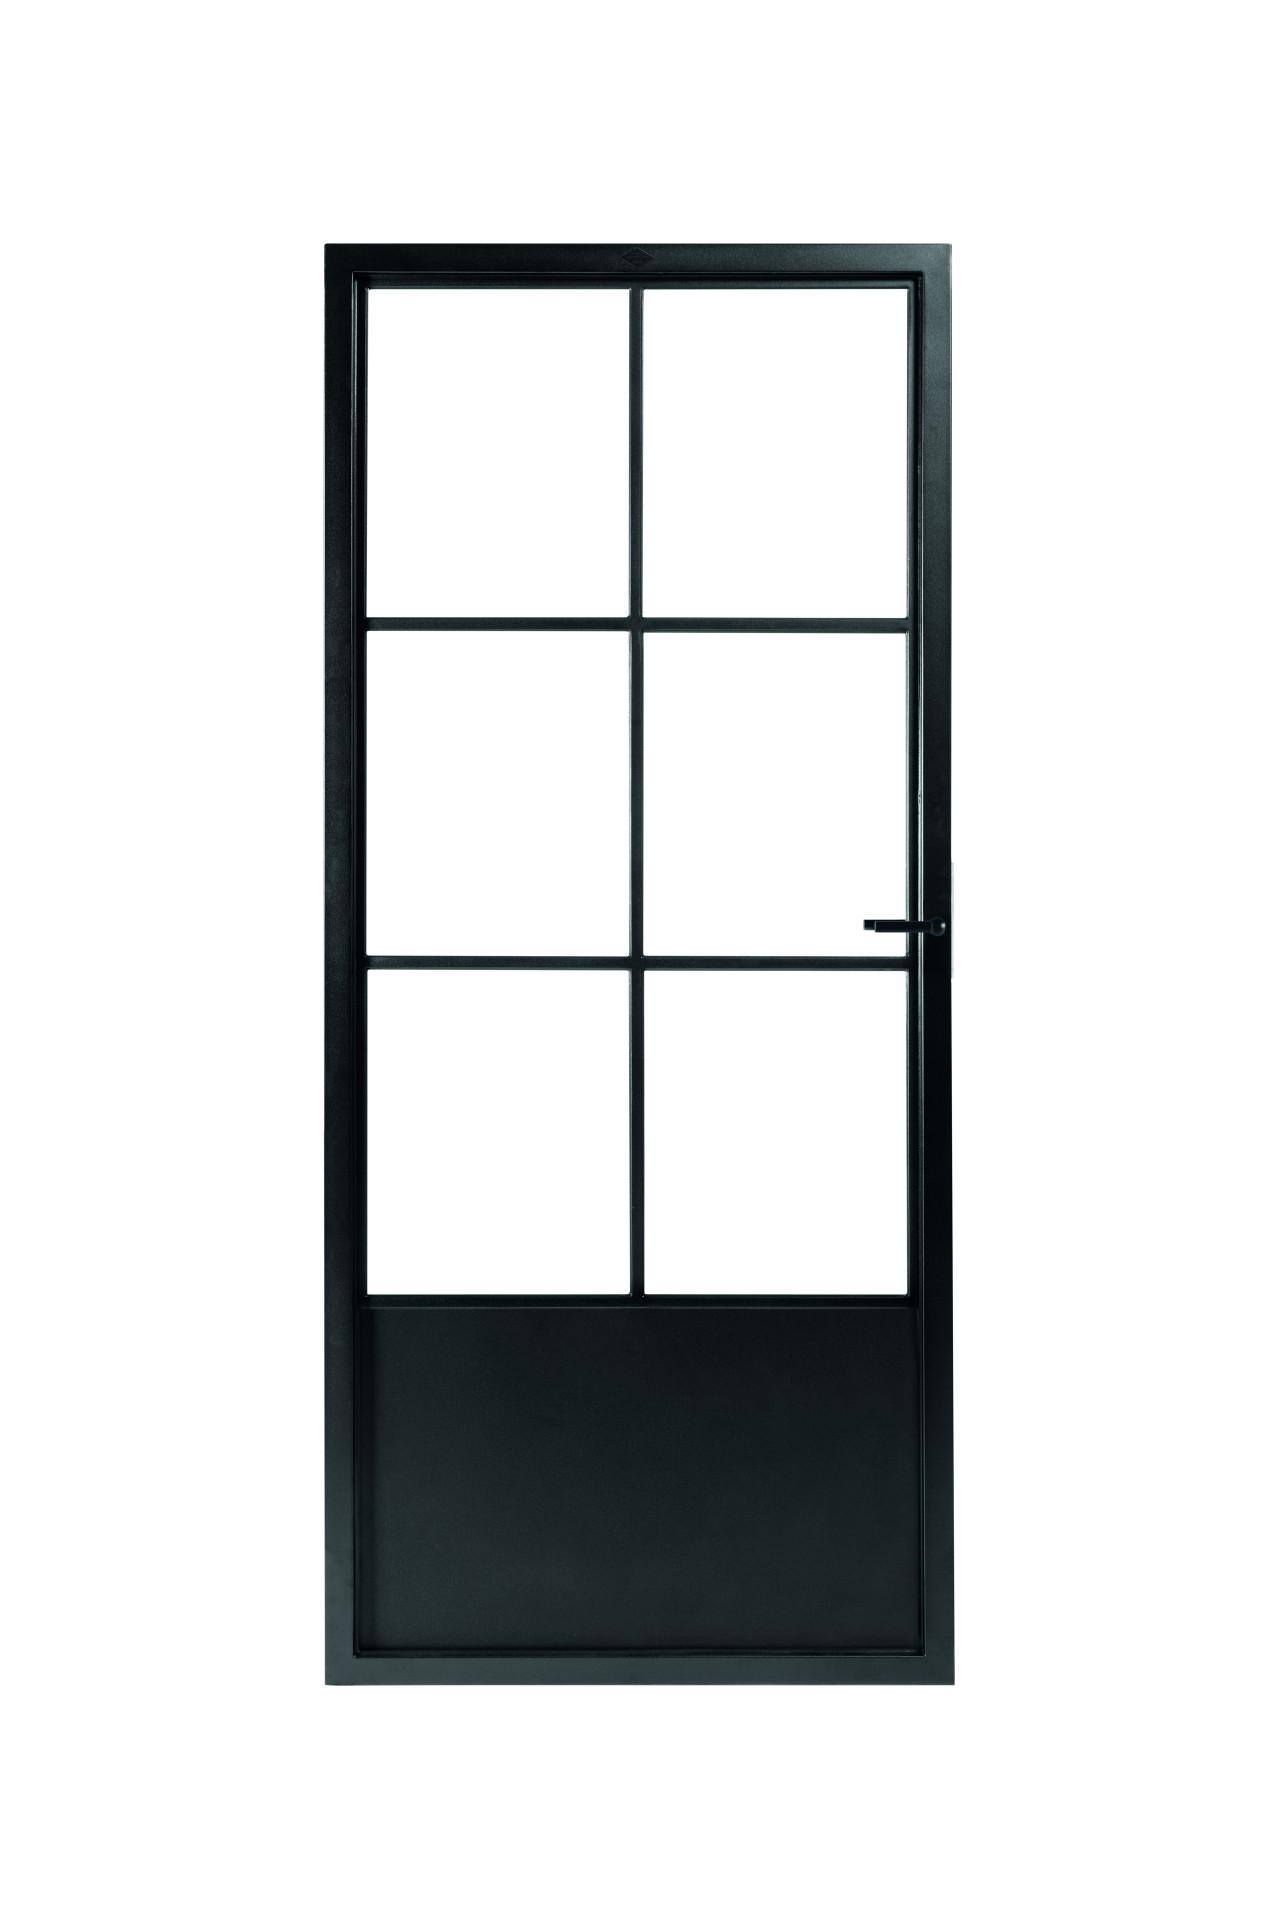 steelit-invisible-classic6-enkel.jpg